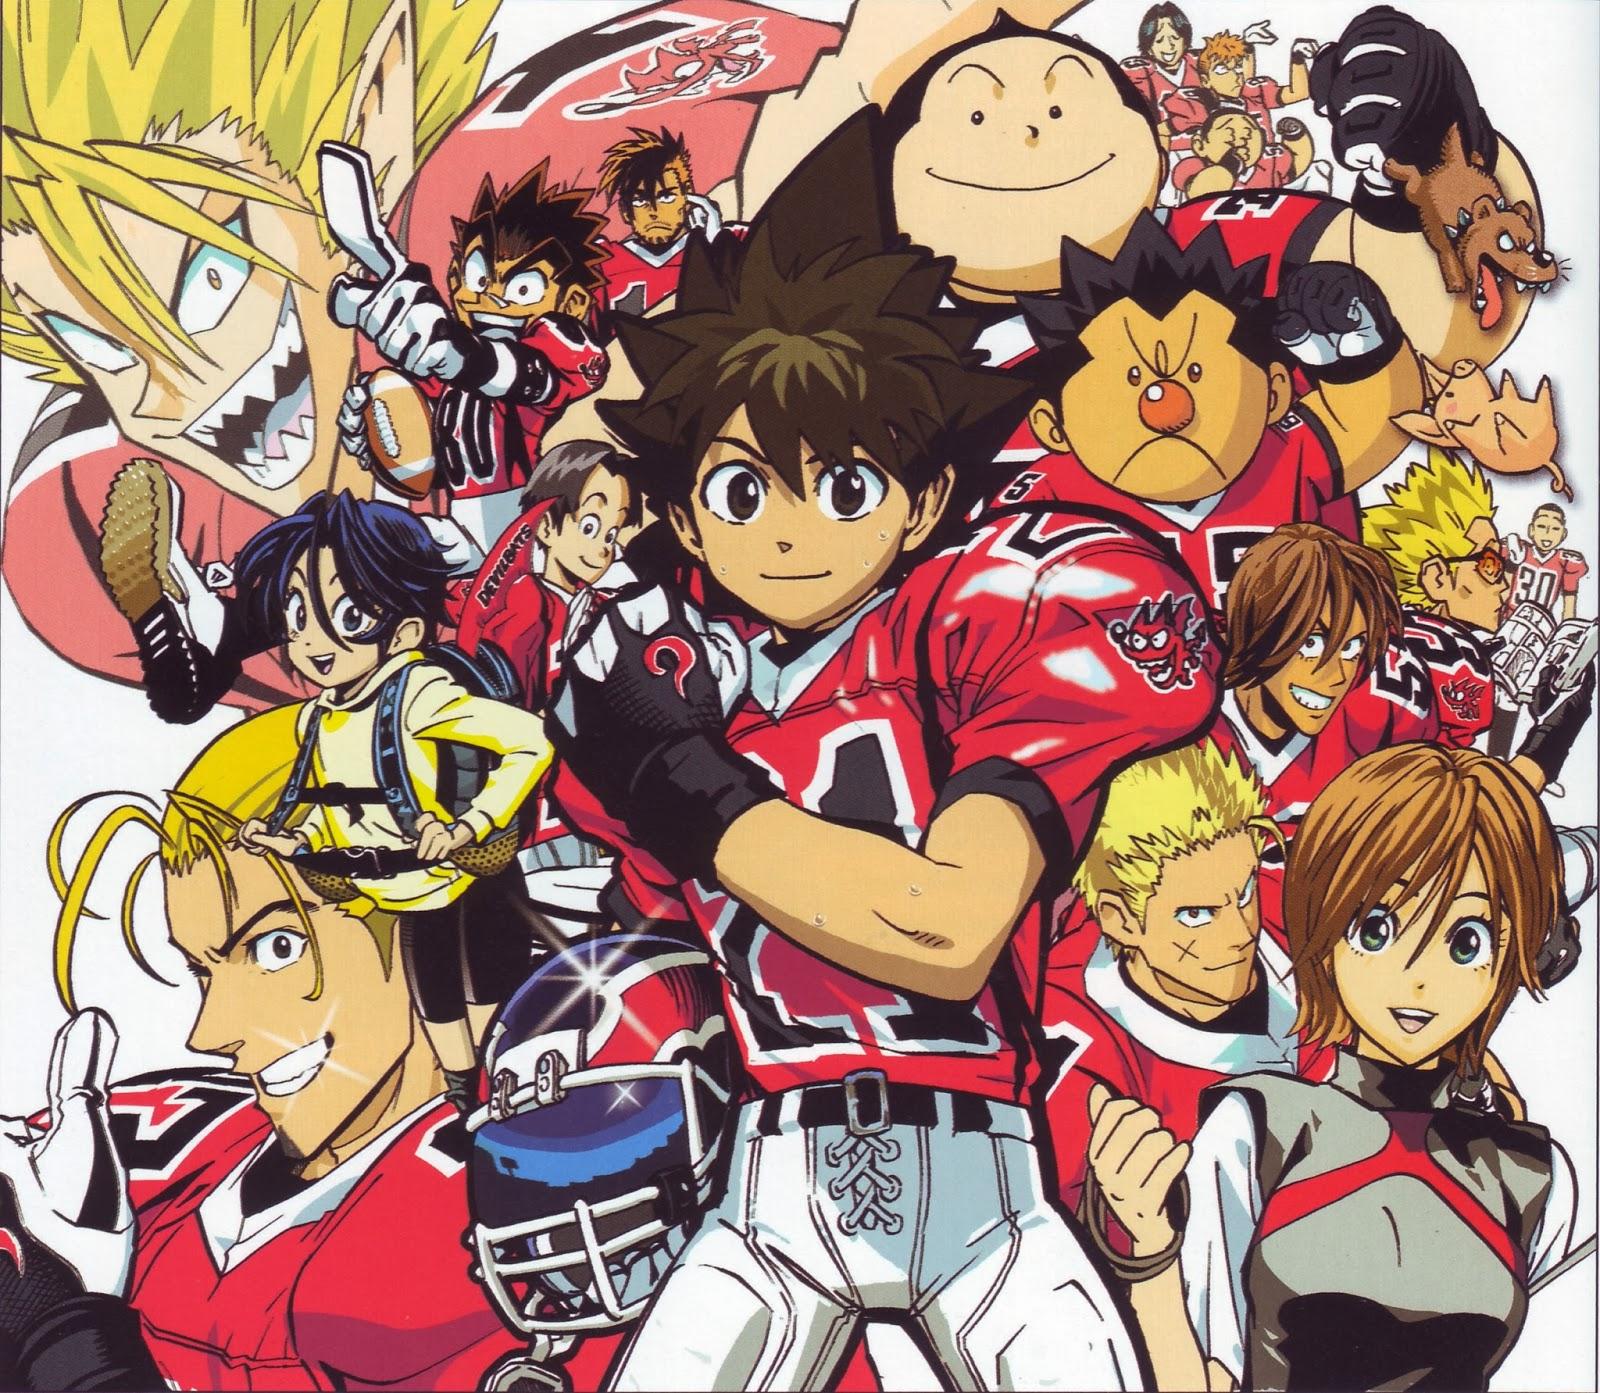 Dimana Download Anime: Eyeshield 21 Episode 1-145 Subtitle Indonesia